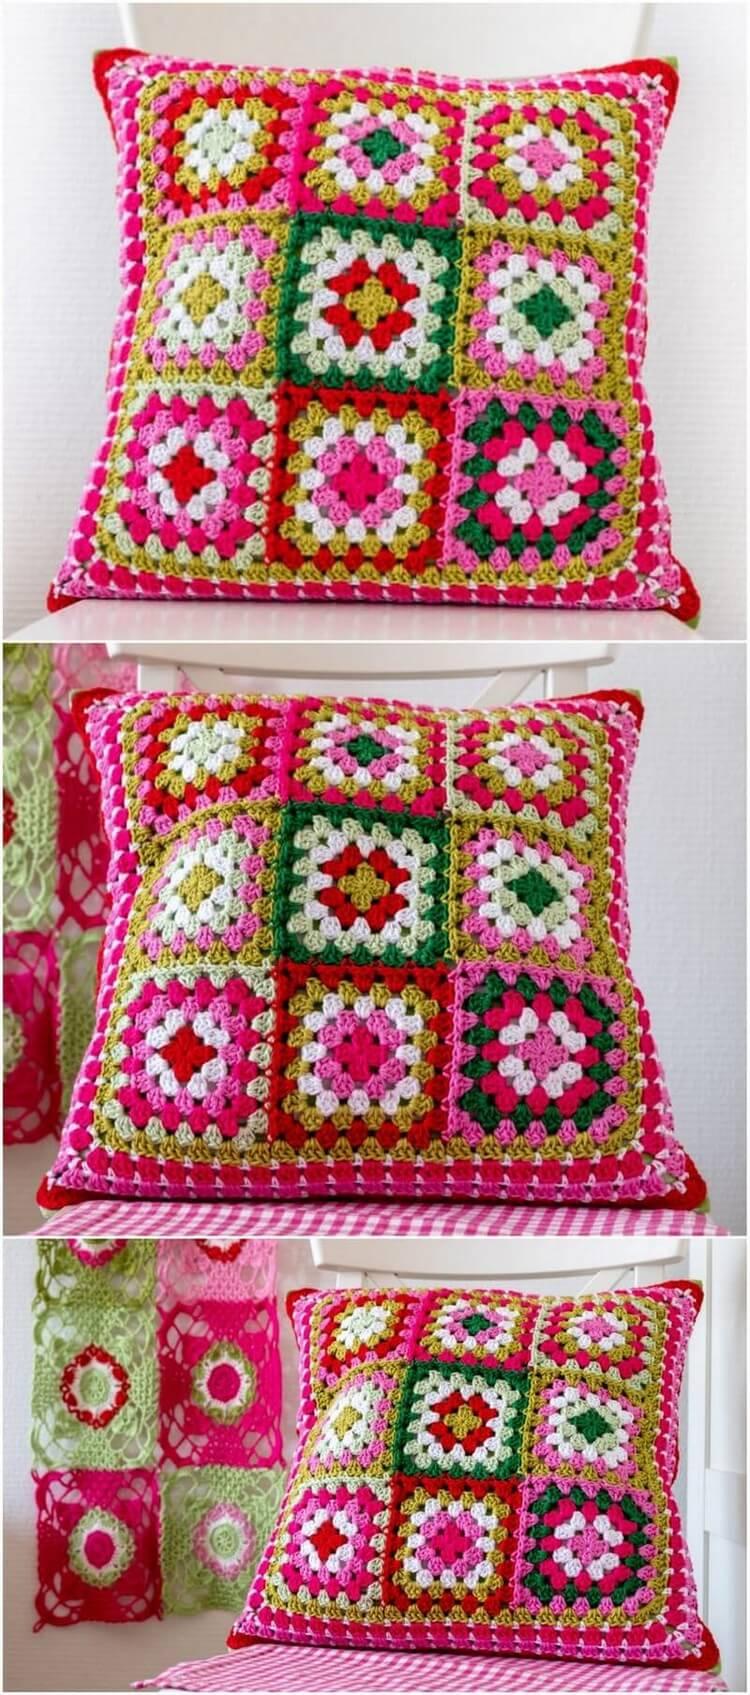 Crochet Pillow Free Pattern (16)